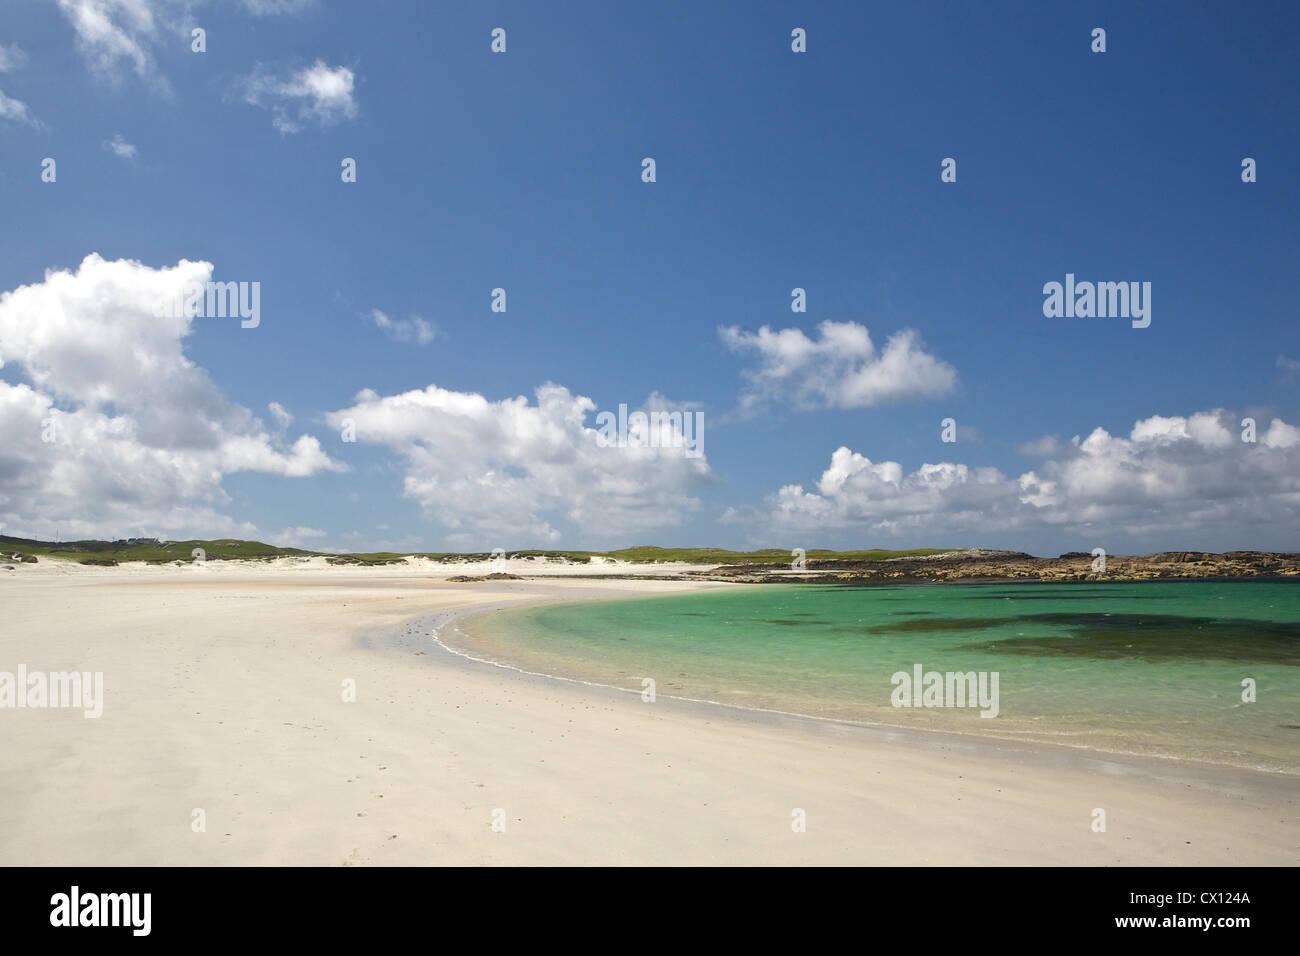 Deserted beach, Connemara, Republic of Ireland Stock Photo